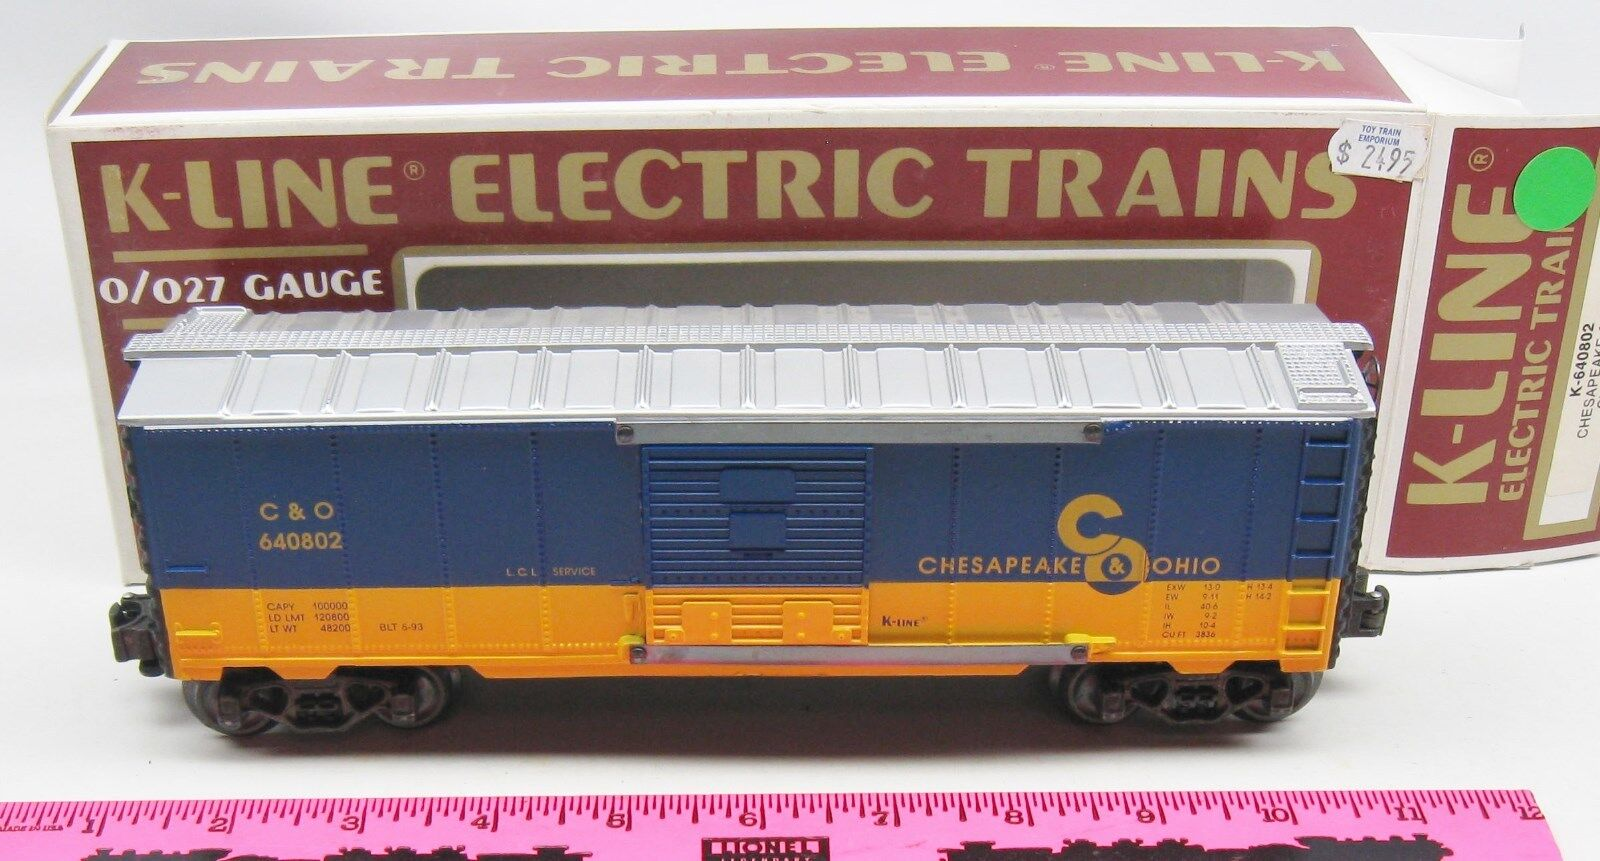 K-line K-640802 Chesapeake & Ohio classic boxcar